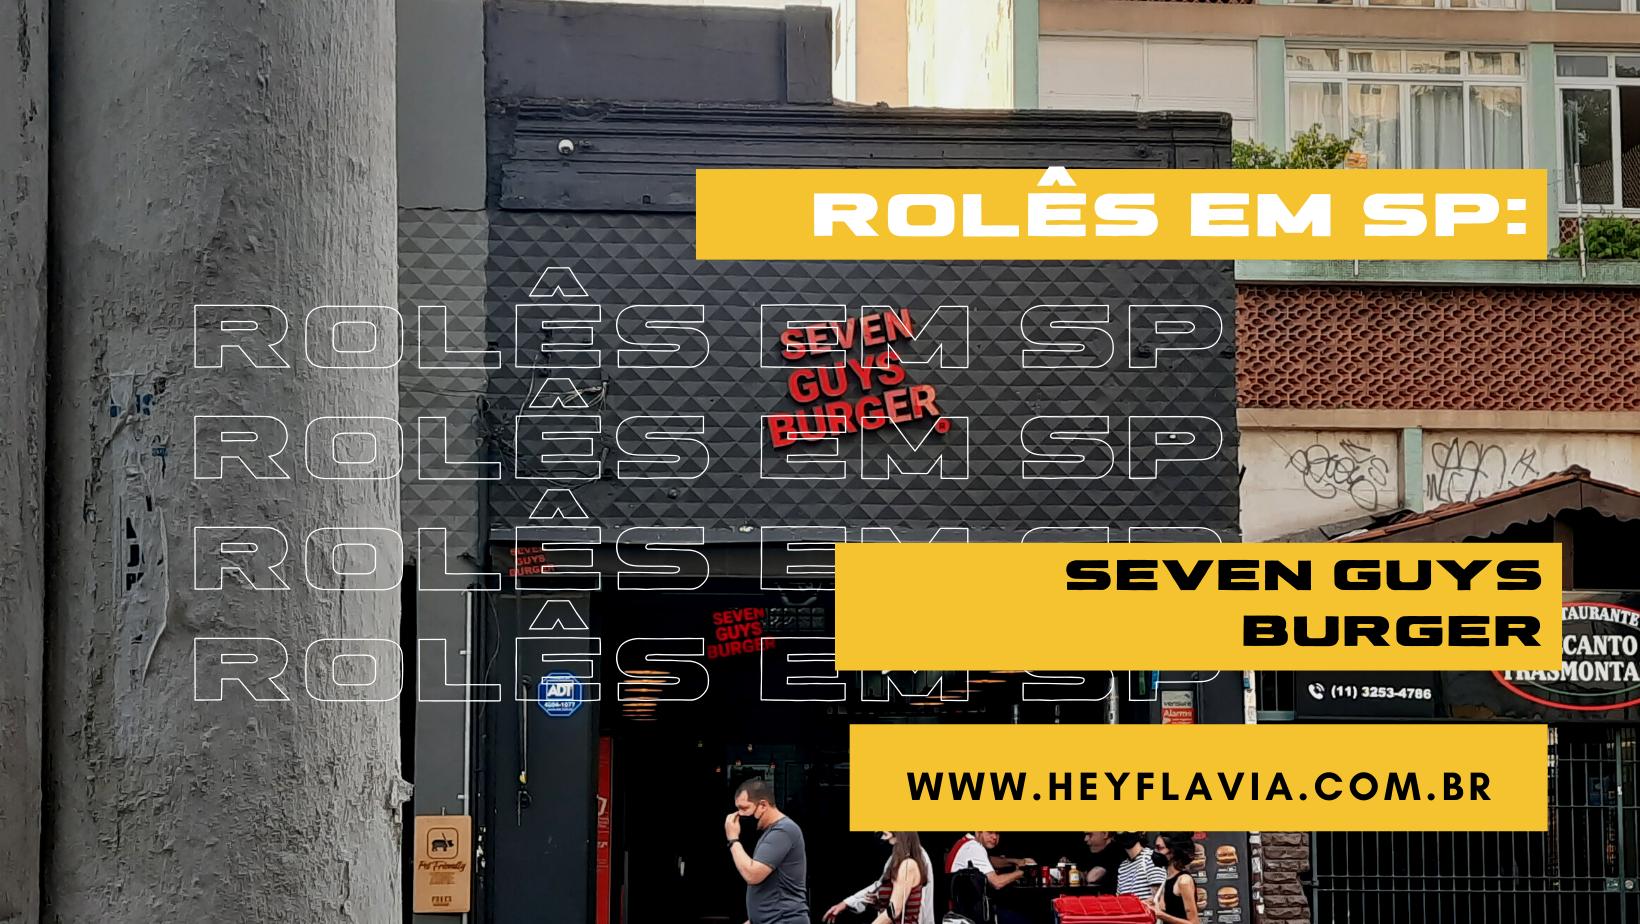 Seven guys burger na augusta